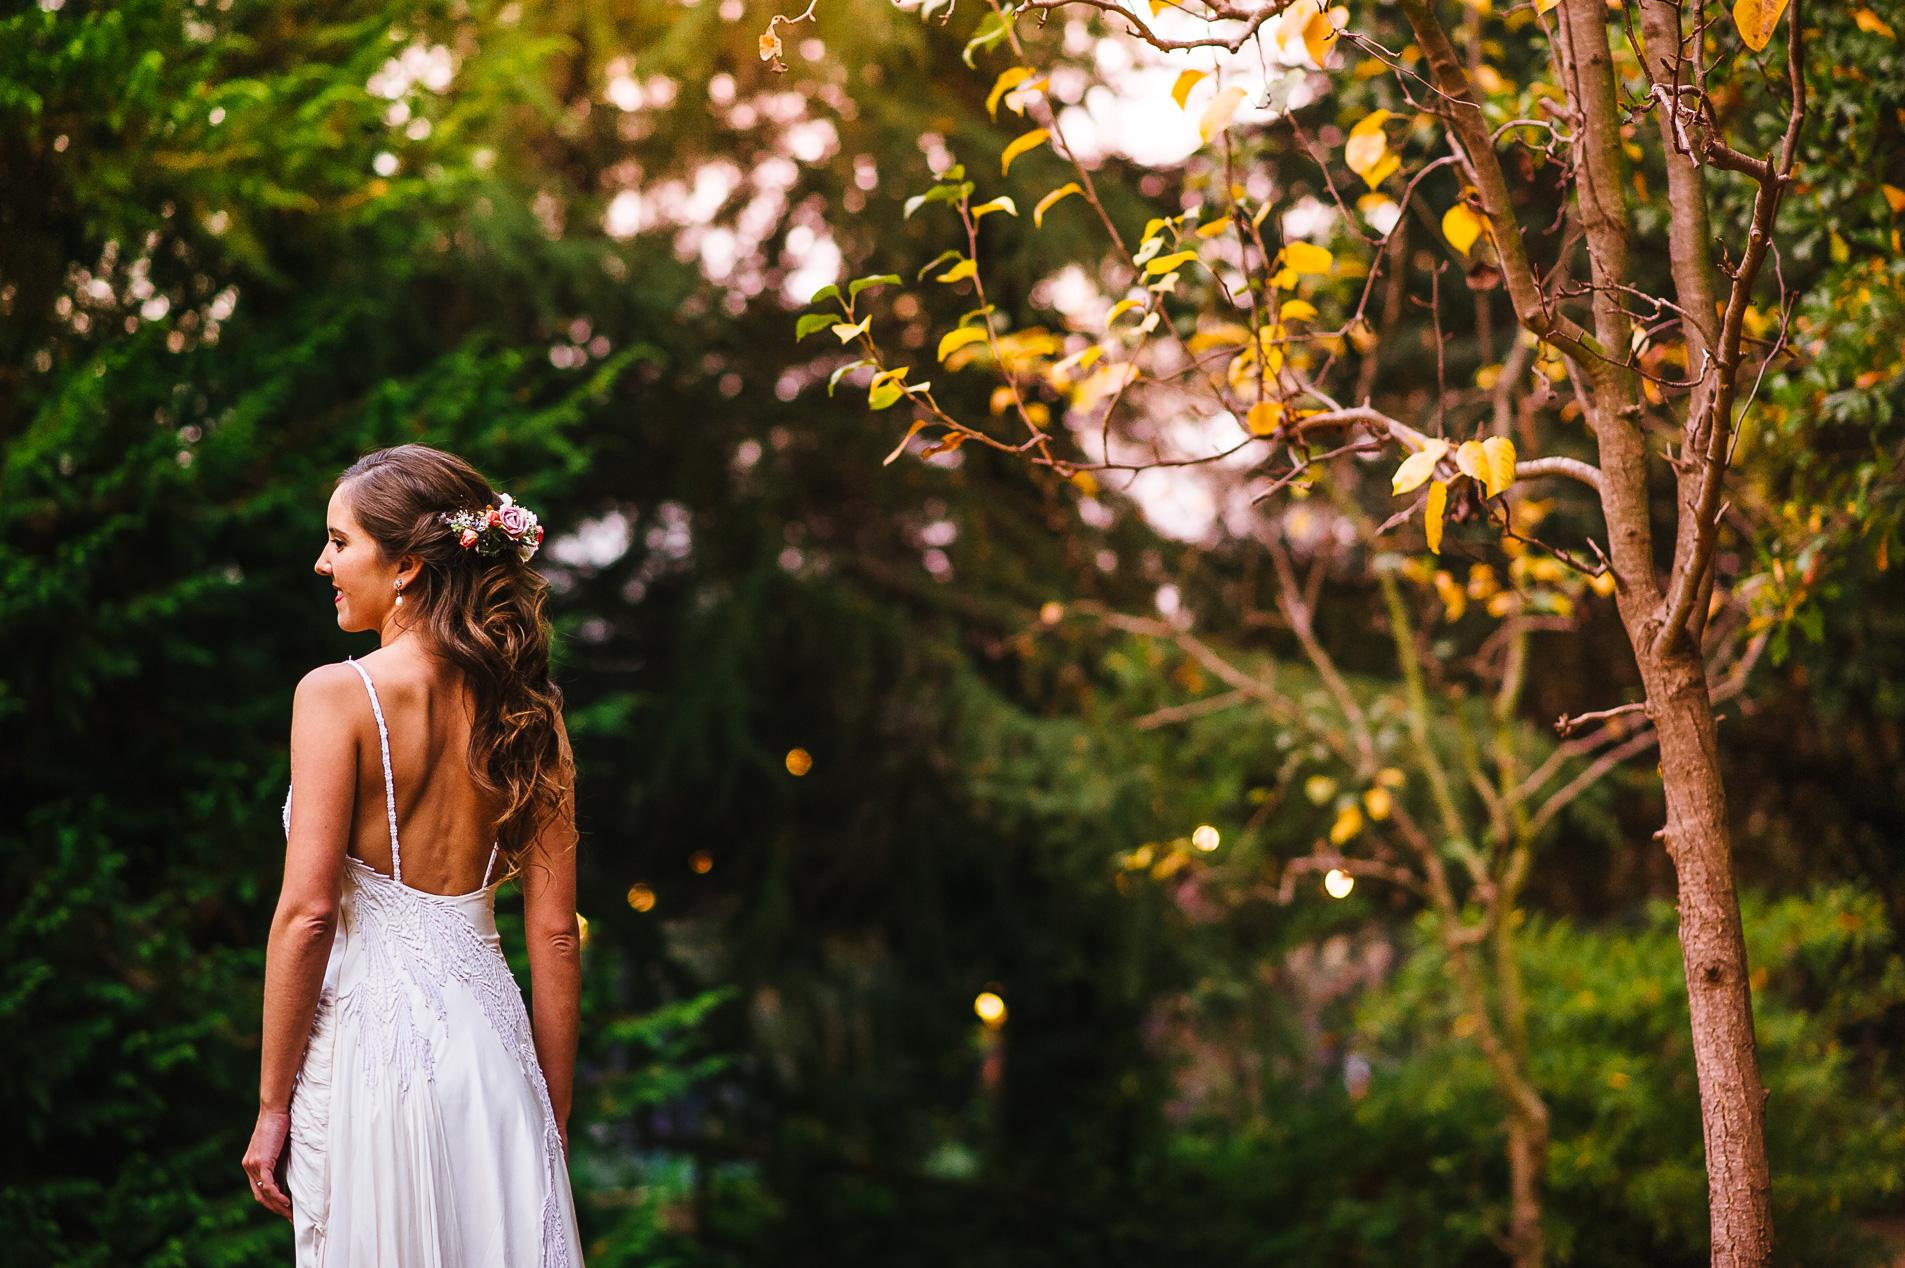 Pacita-Diego-matrimonio-otoño-32